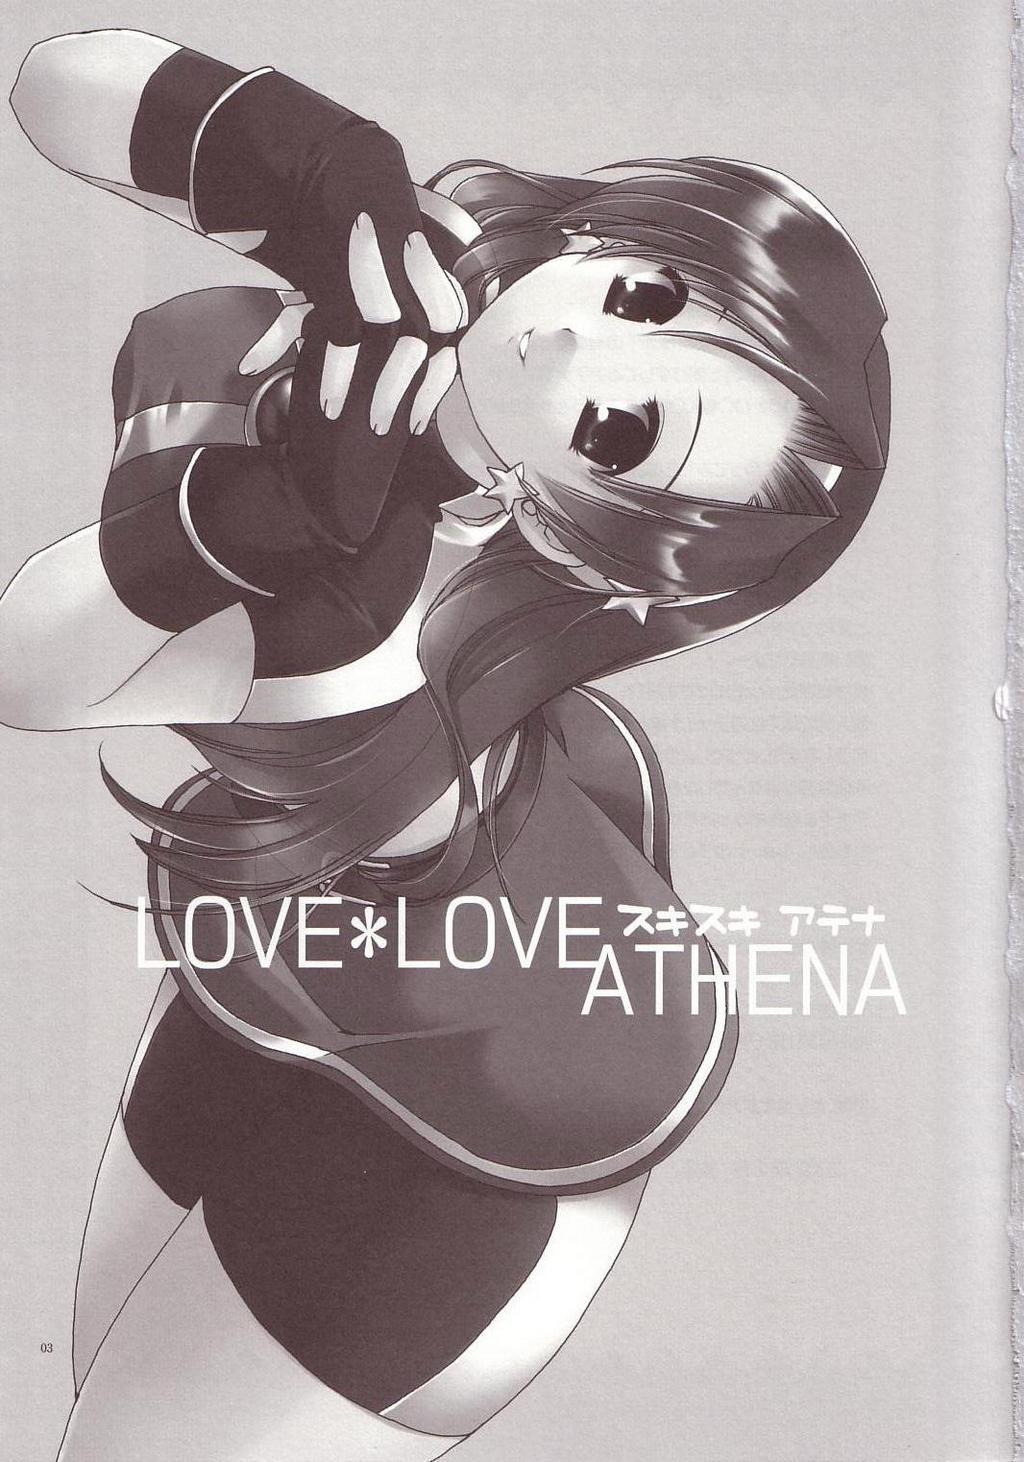 LOVE*LOVE ATHENA 1